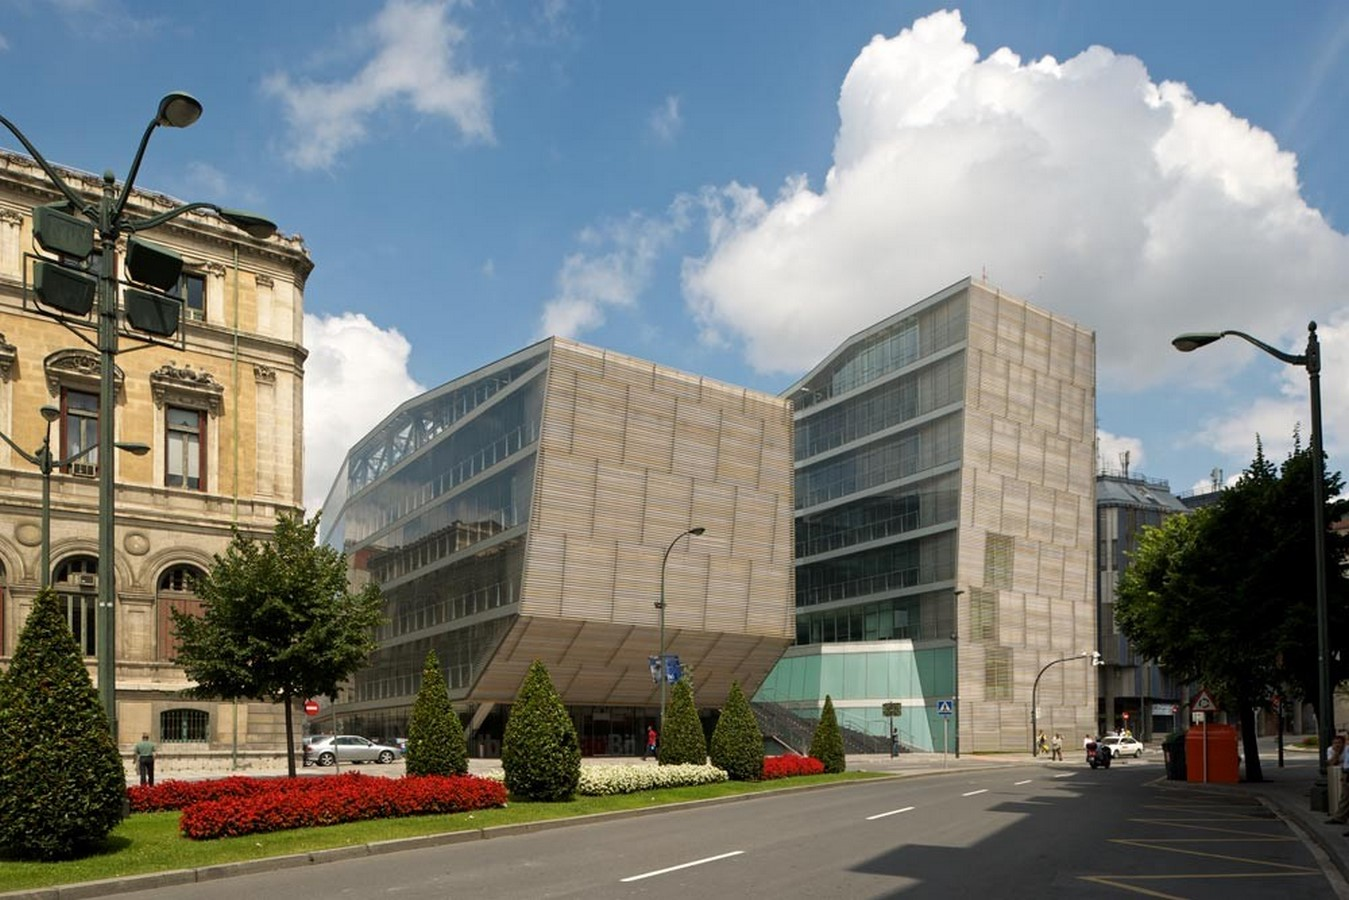 Bilbao City Hall - Sheet1